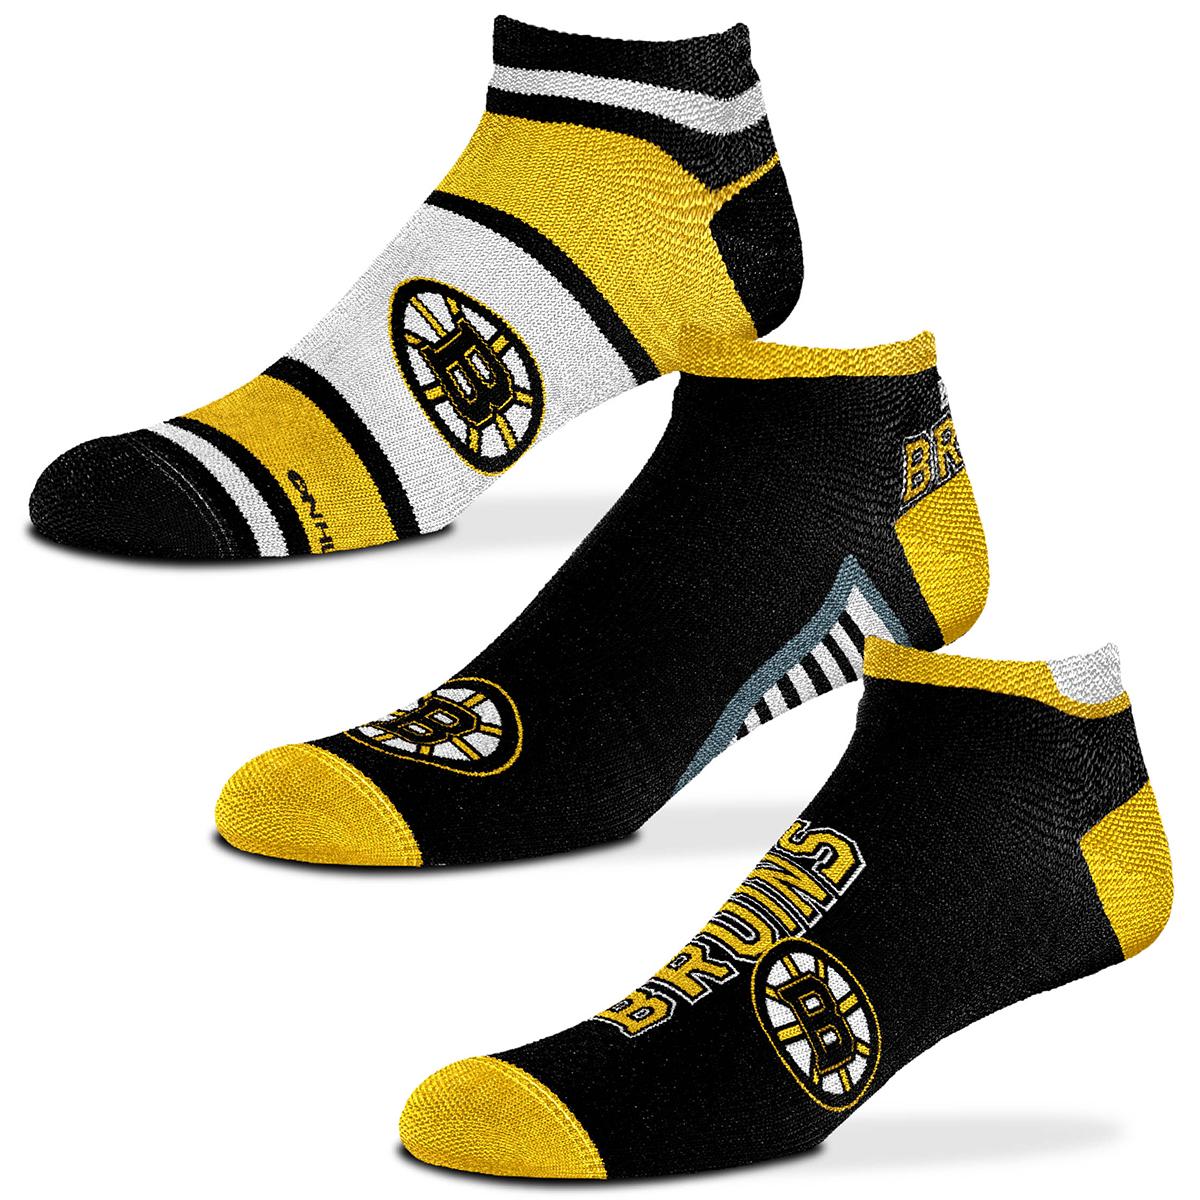 Boston Bruins Show Me The Money Socks, 3 Pack - Various Patterns, L